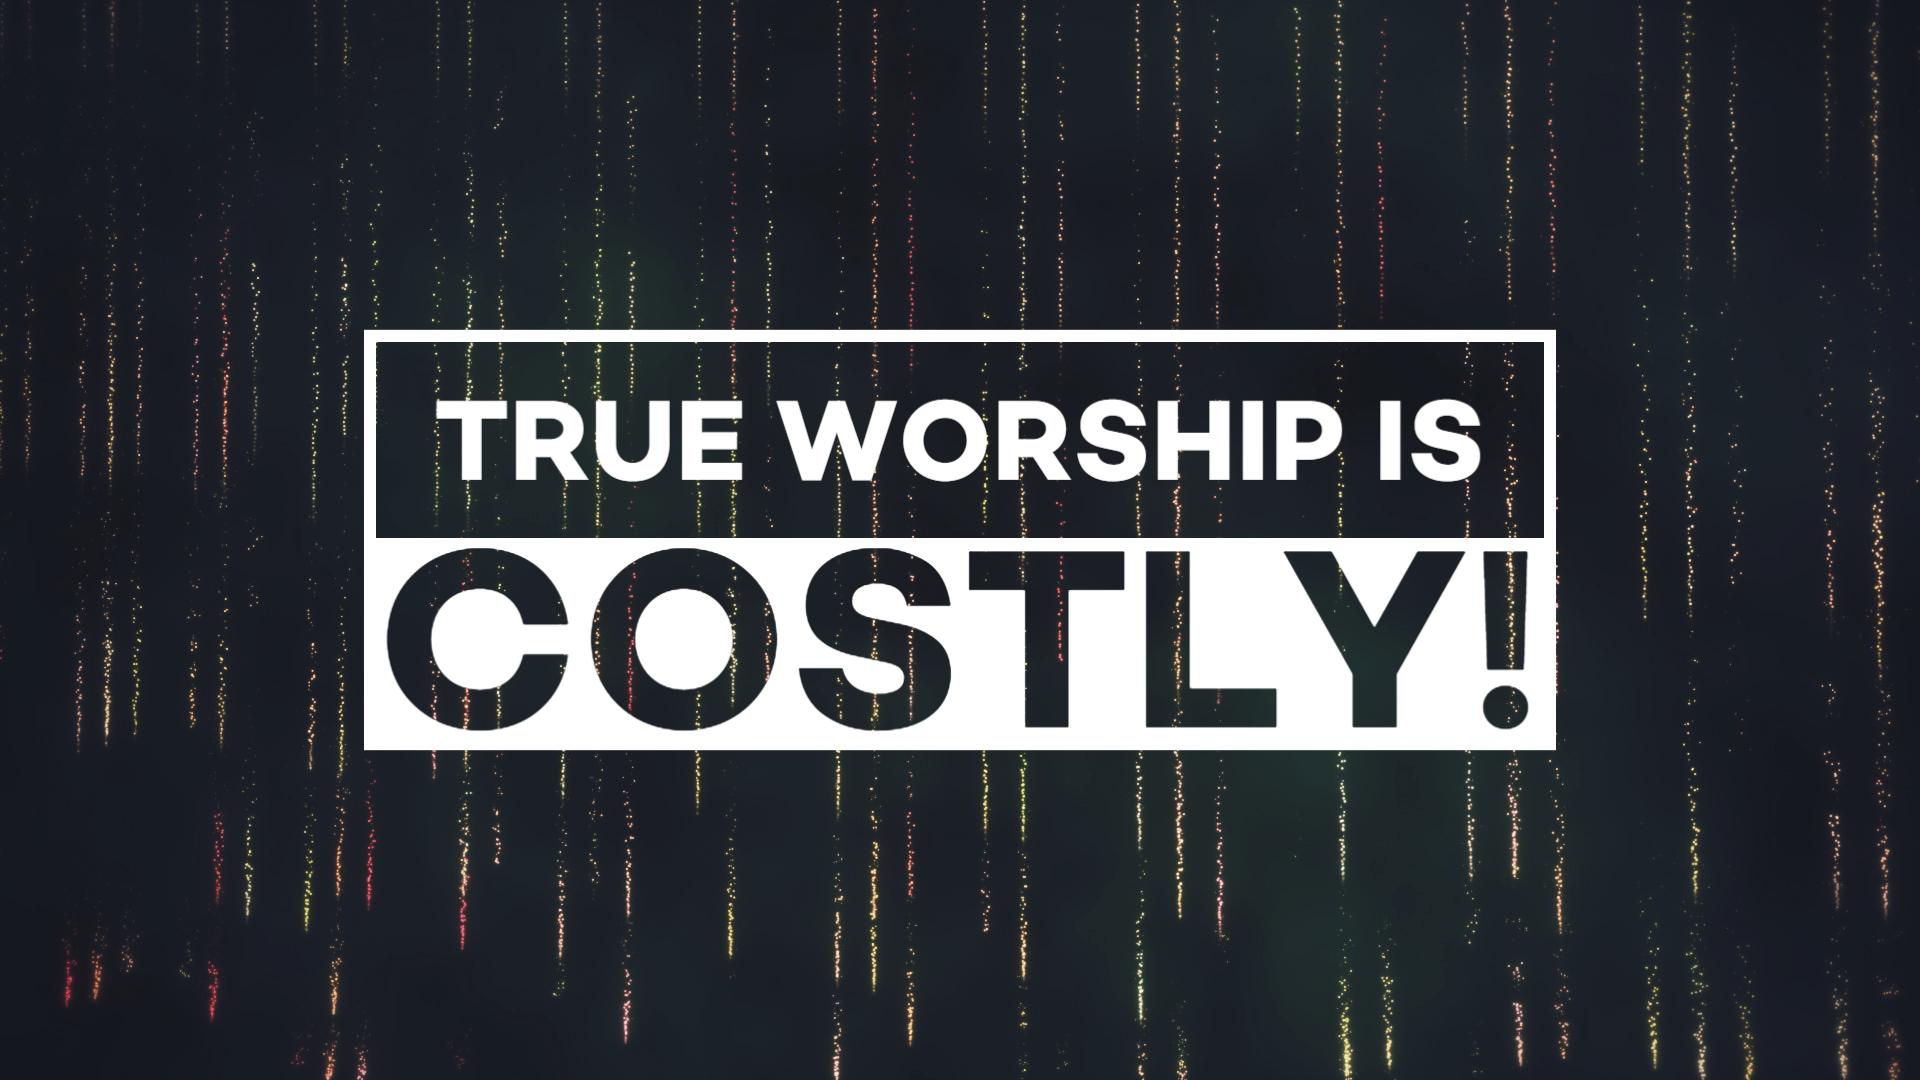 Baby Dedication/ True Worship is Costly!